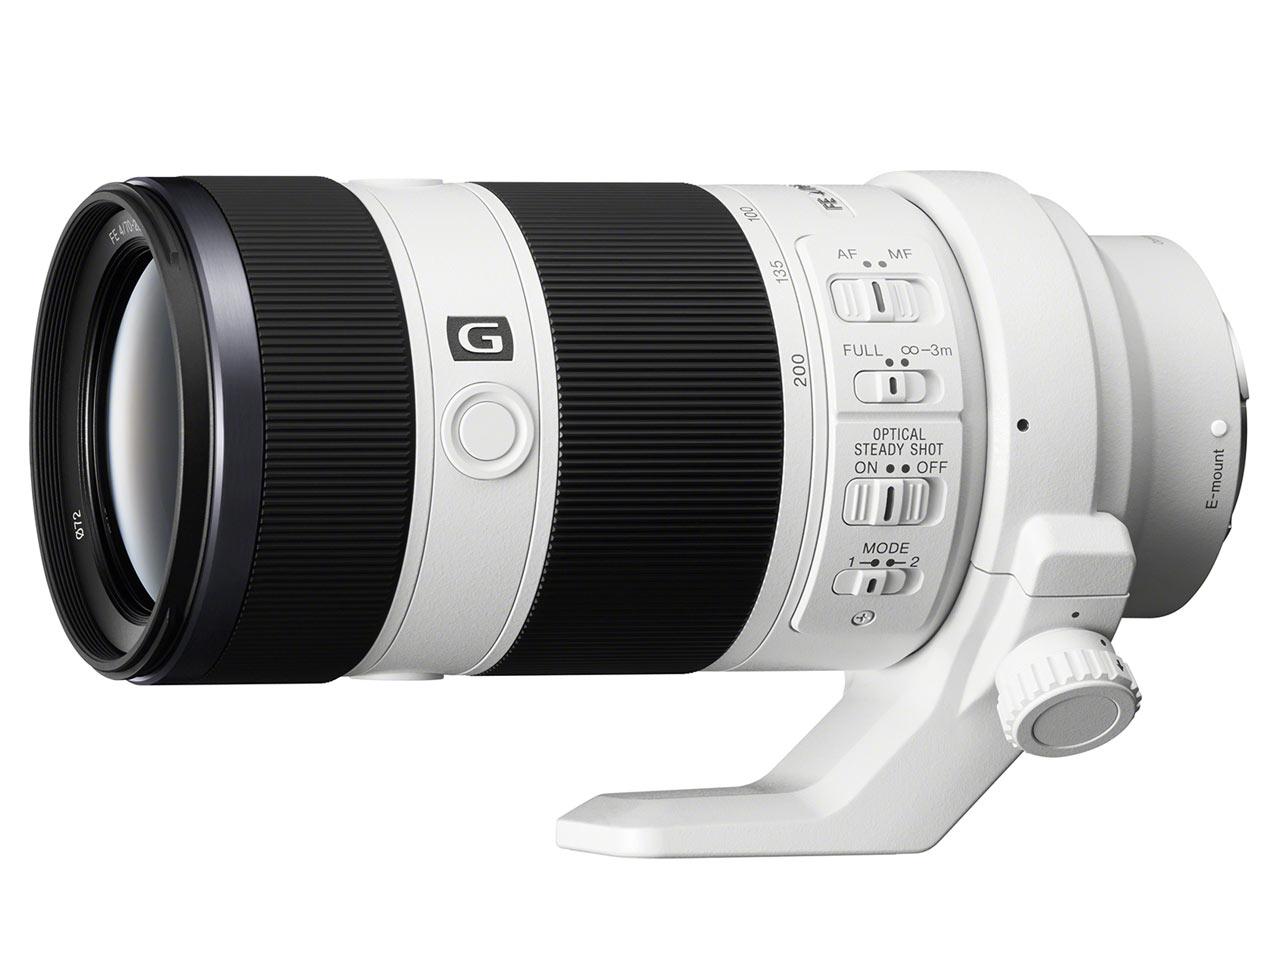 Sony Fe 70 200mm F4 G Oss Digital Photography Live